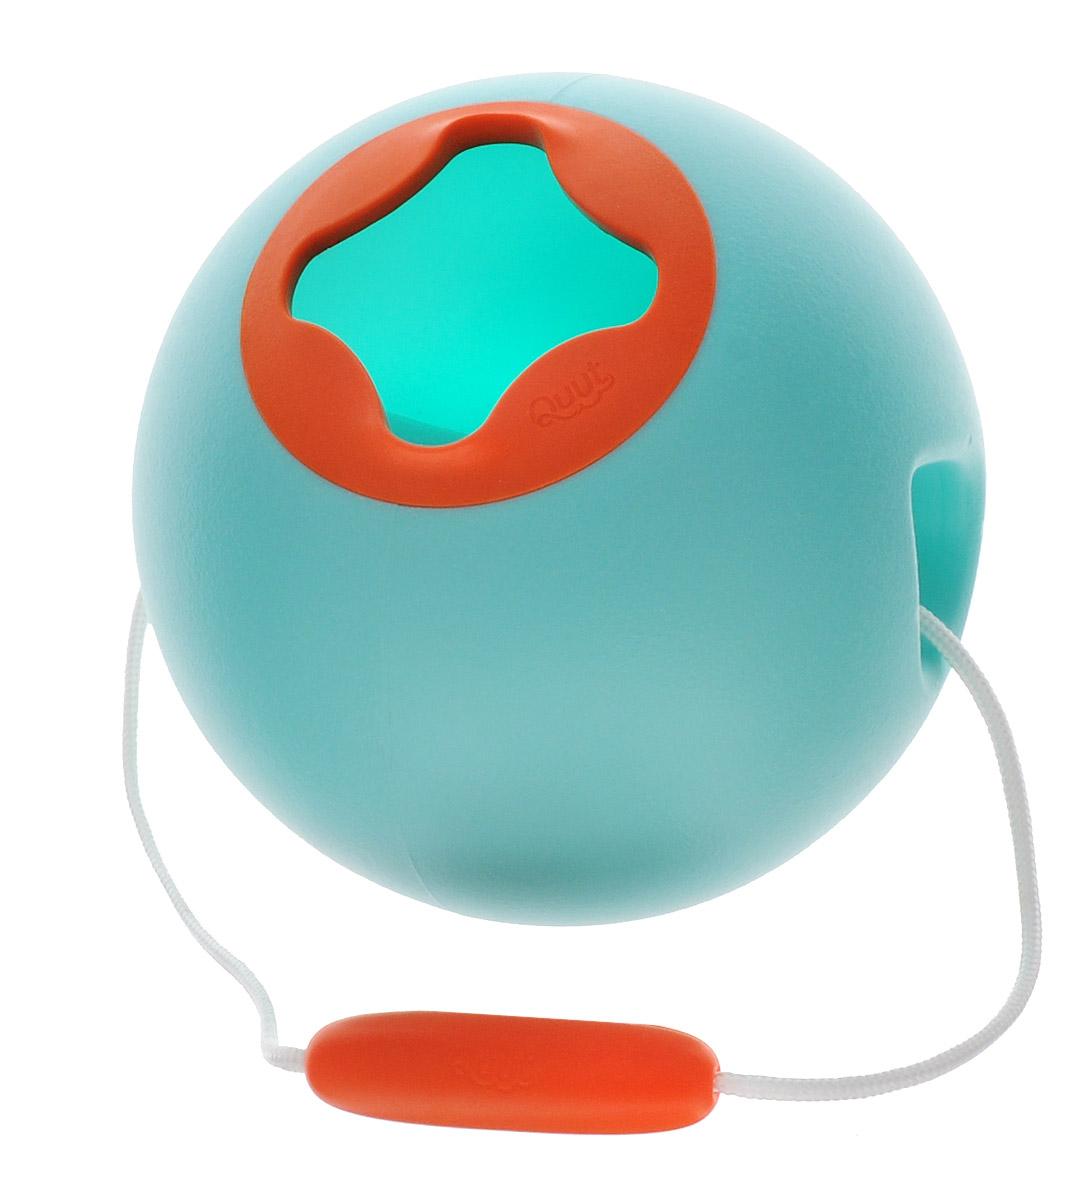 Quut Ведерко для воды Ballo цвет голубой dedo music gifts mg 308 pure handmade rotating guitar music box blue